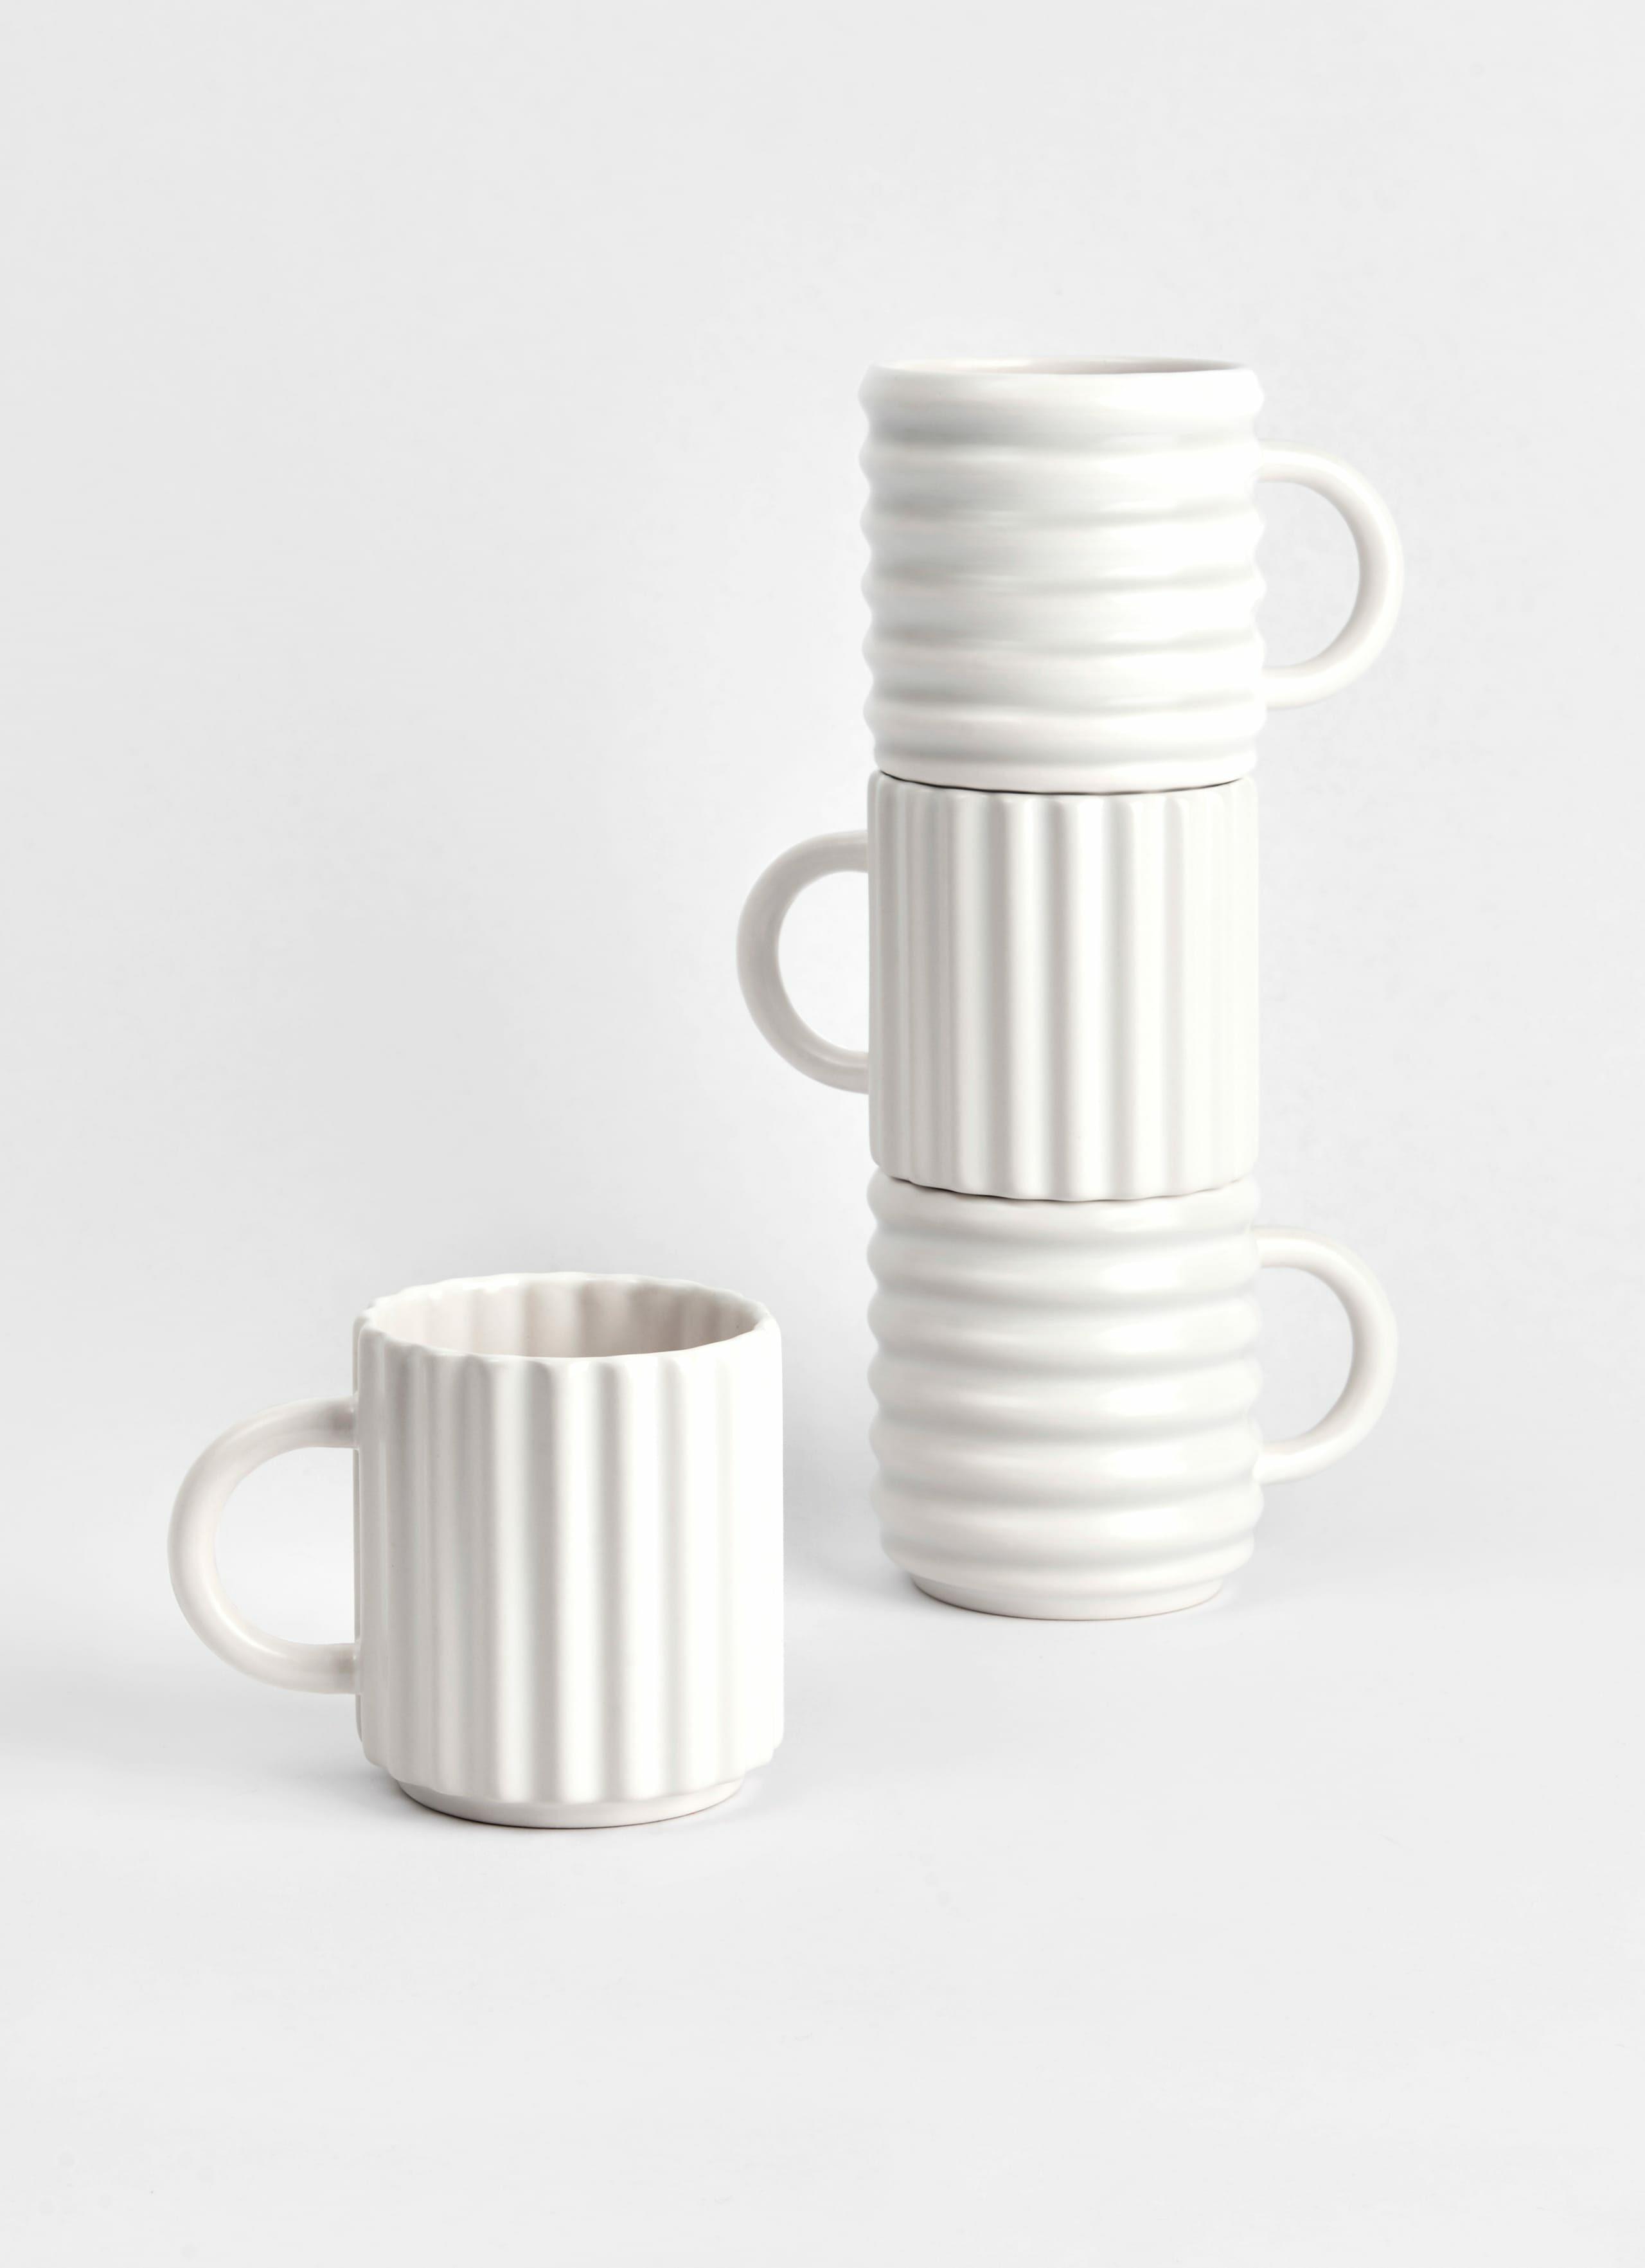 Form and Seek - 3D printed - Porcelain -Ripple Mugs - Set of 2